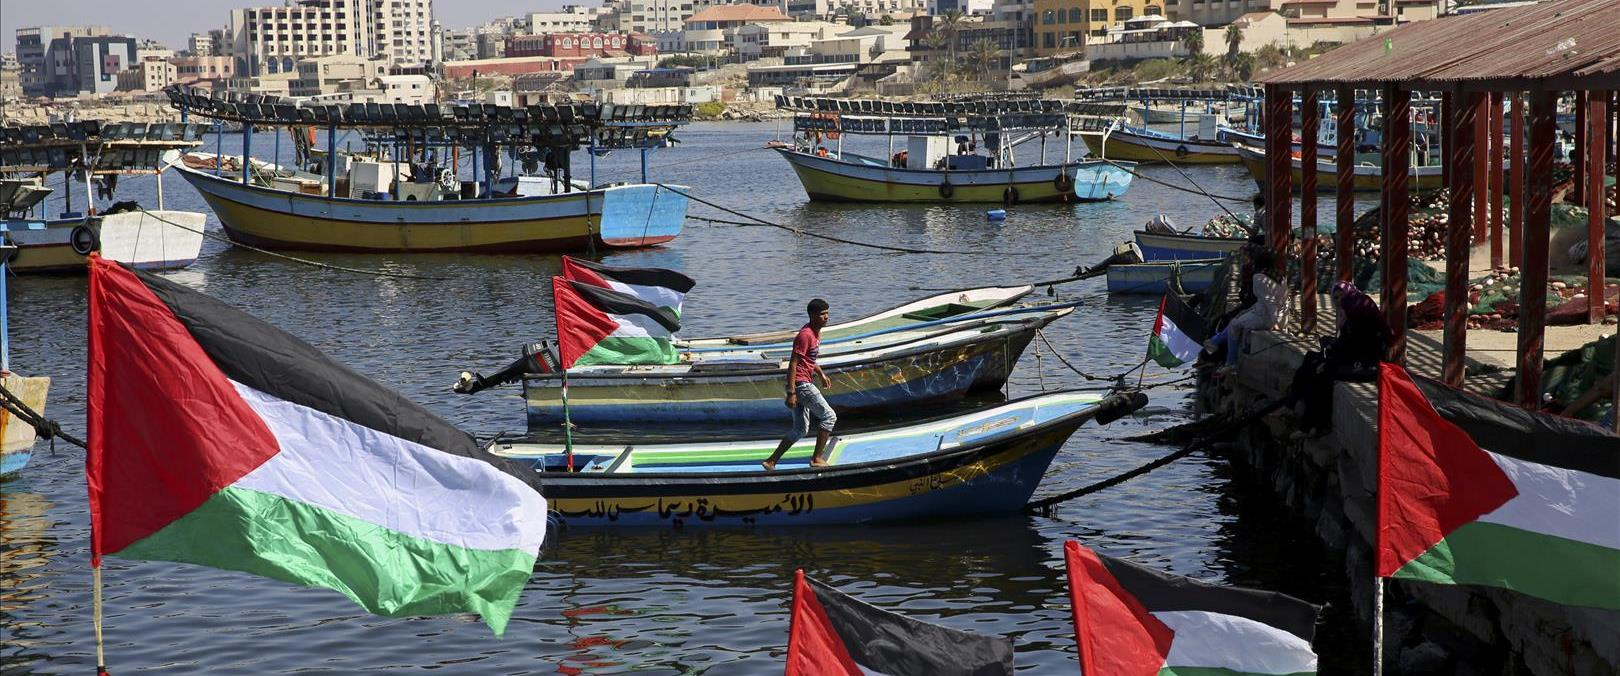 Franja de Gaza pescadores